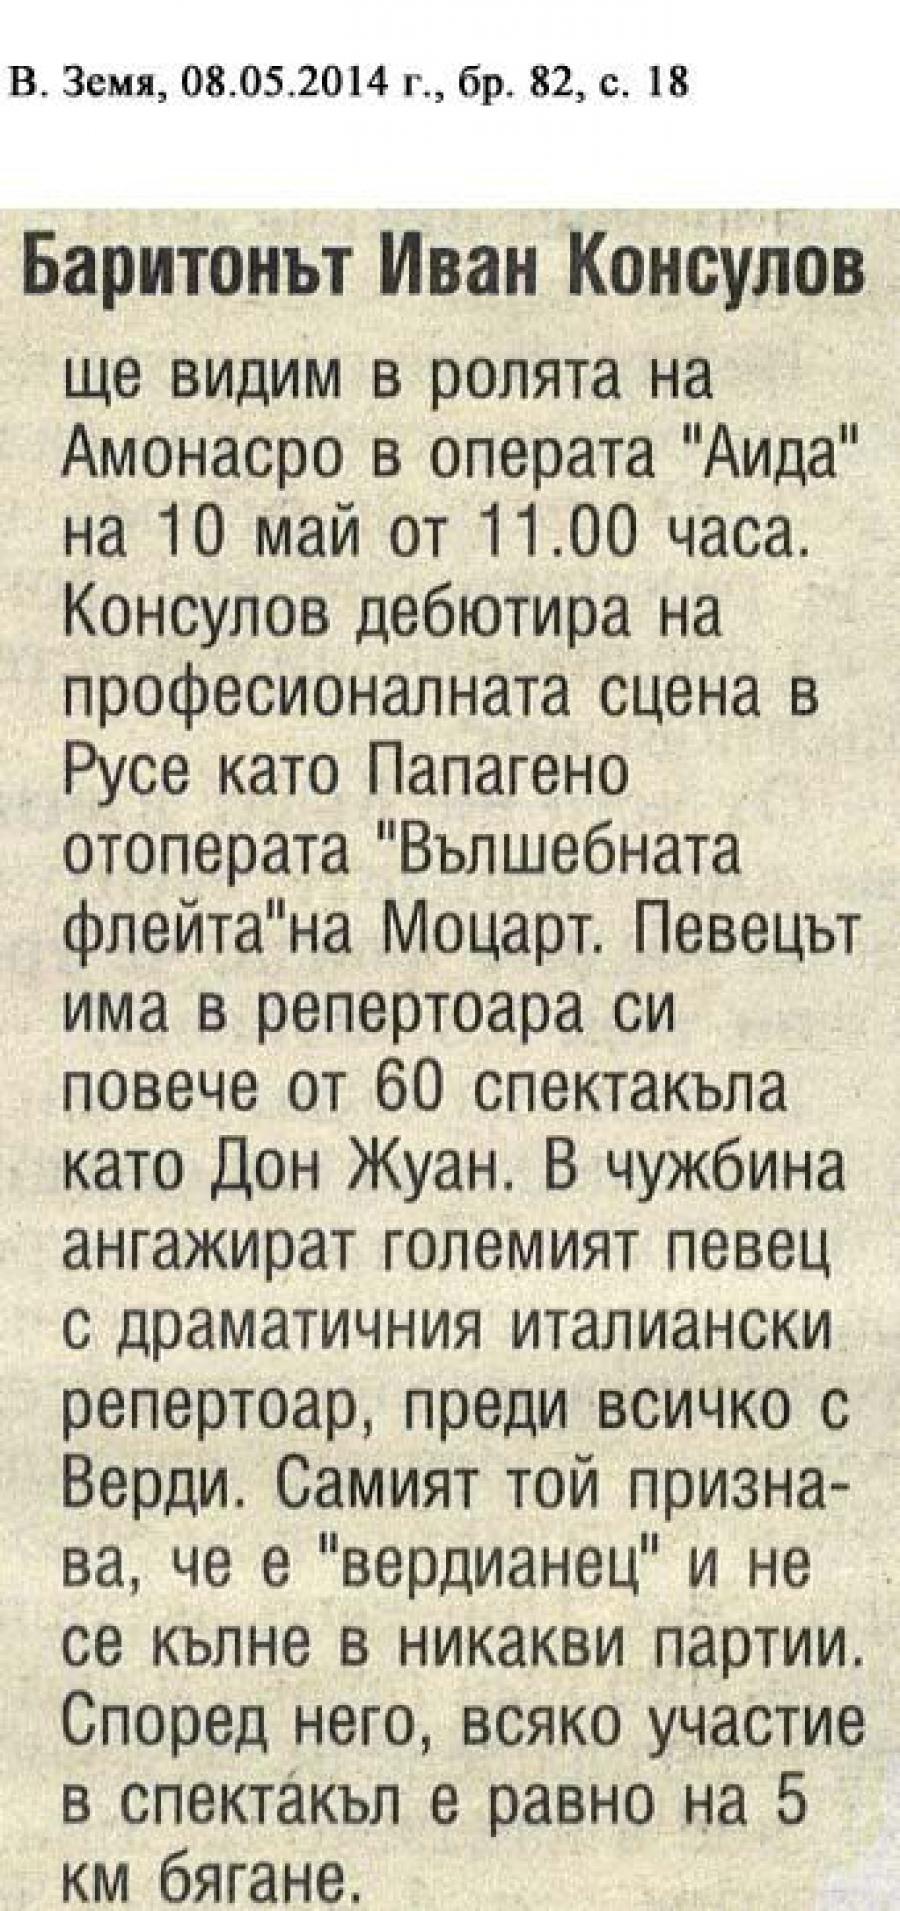 Баритонът Иван Консулов - в-к Земя 08.05.14